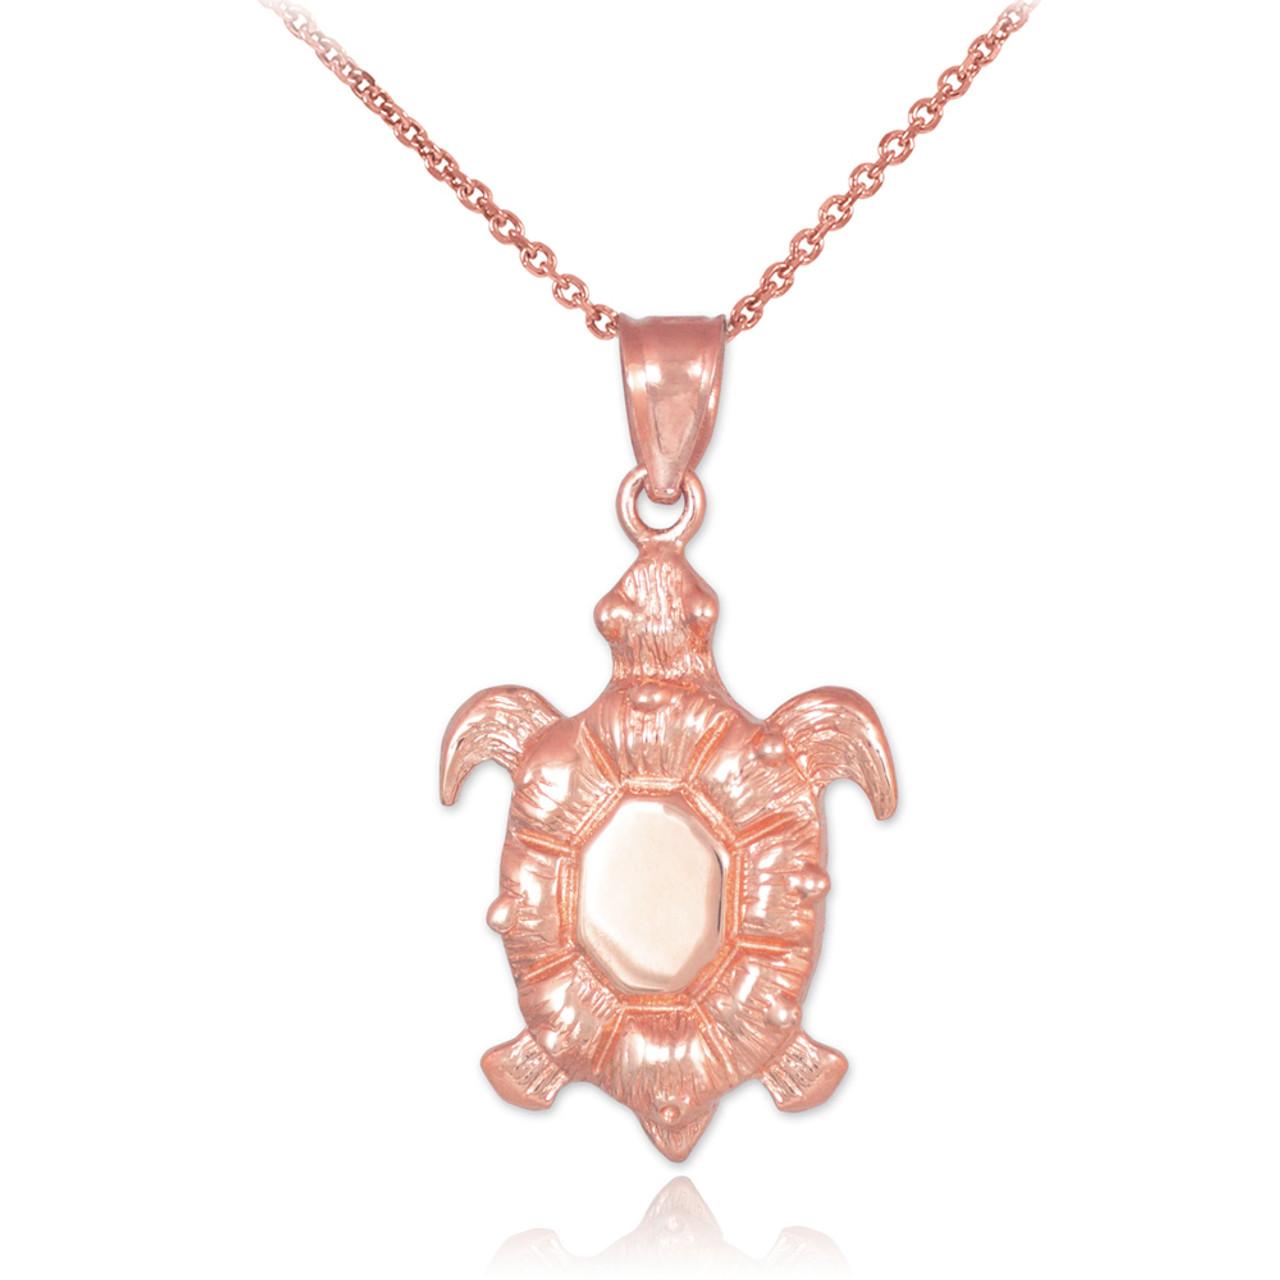 Rose gold sea turtle pendant rose gold sea turtle pendant necklace mozeypictures Images